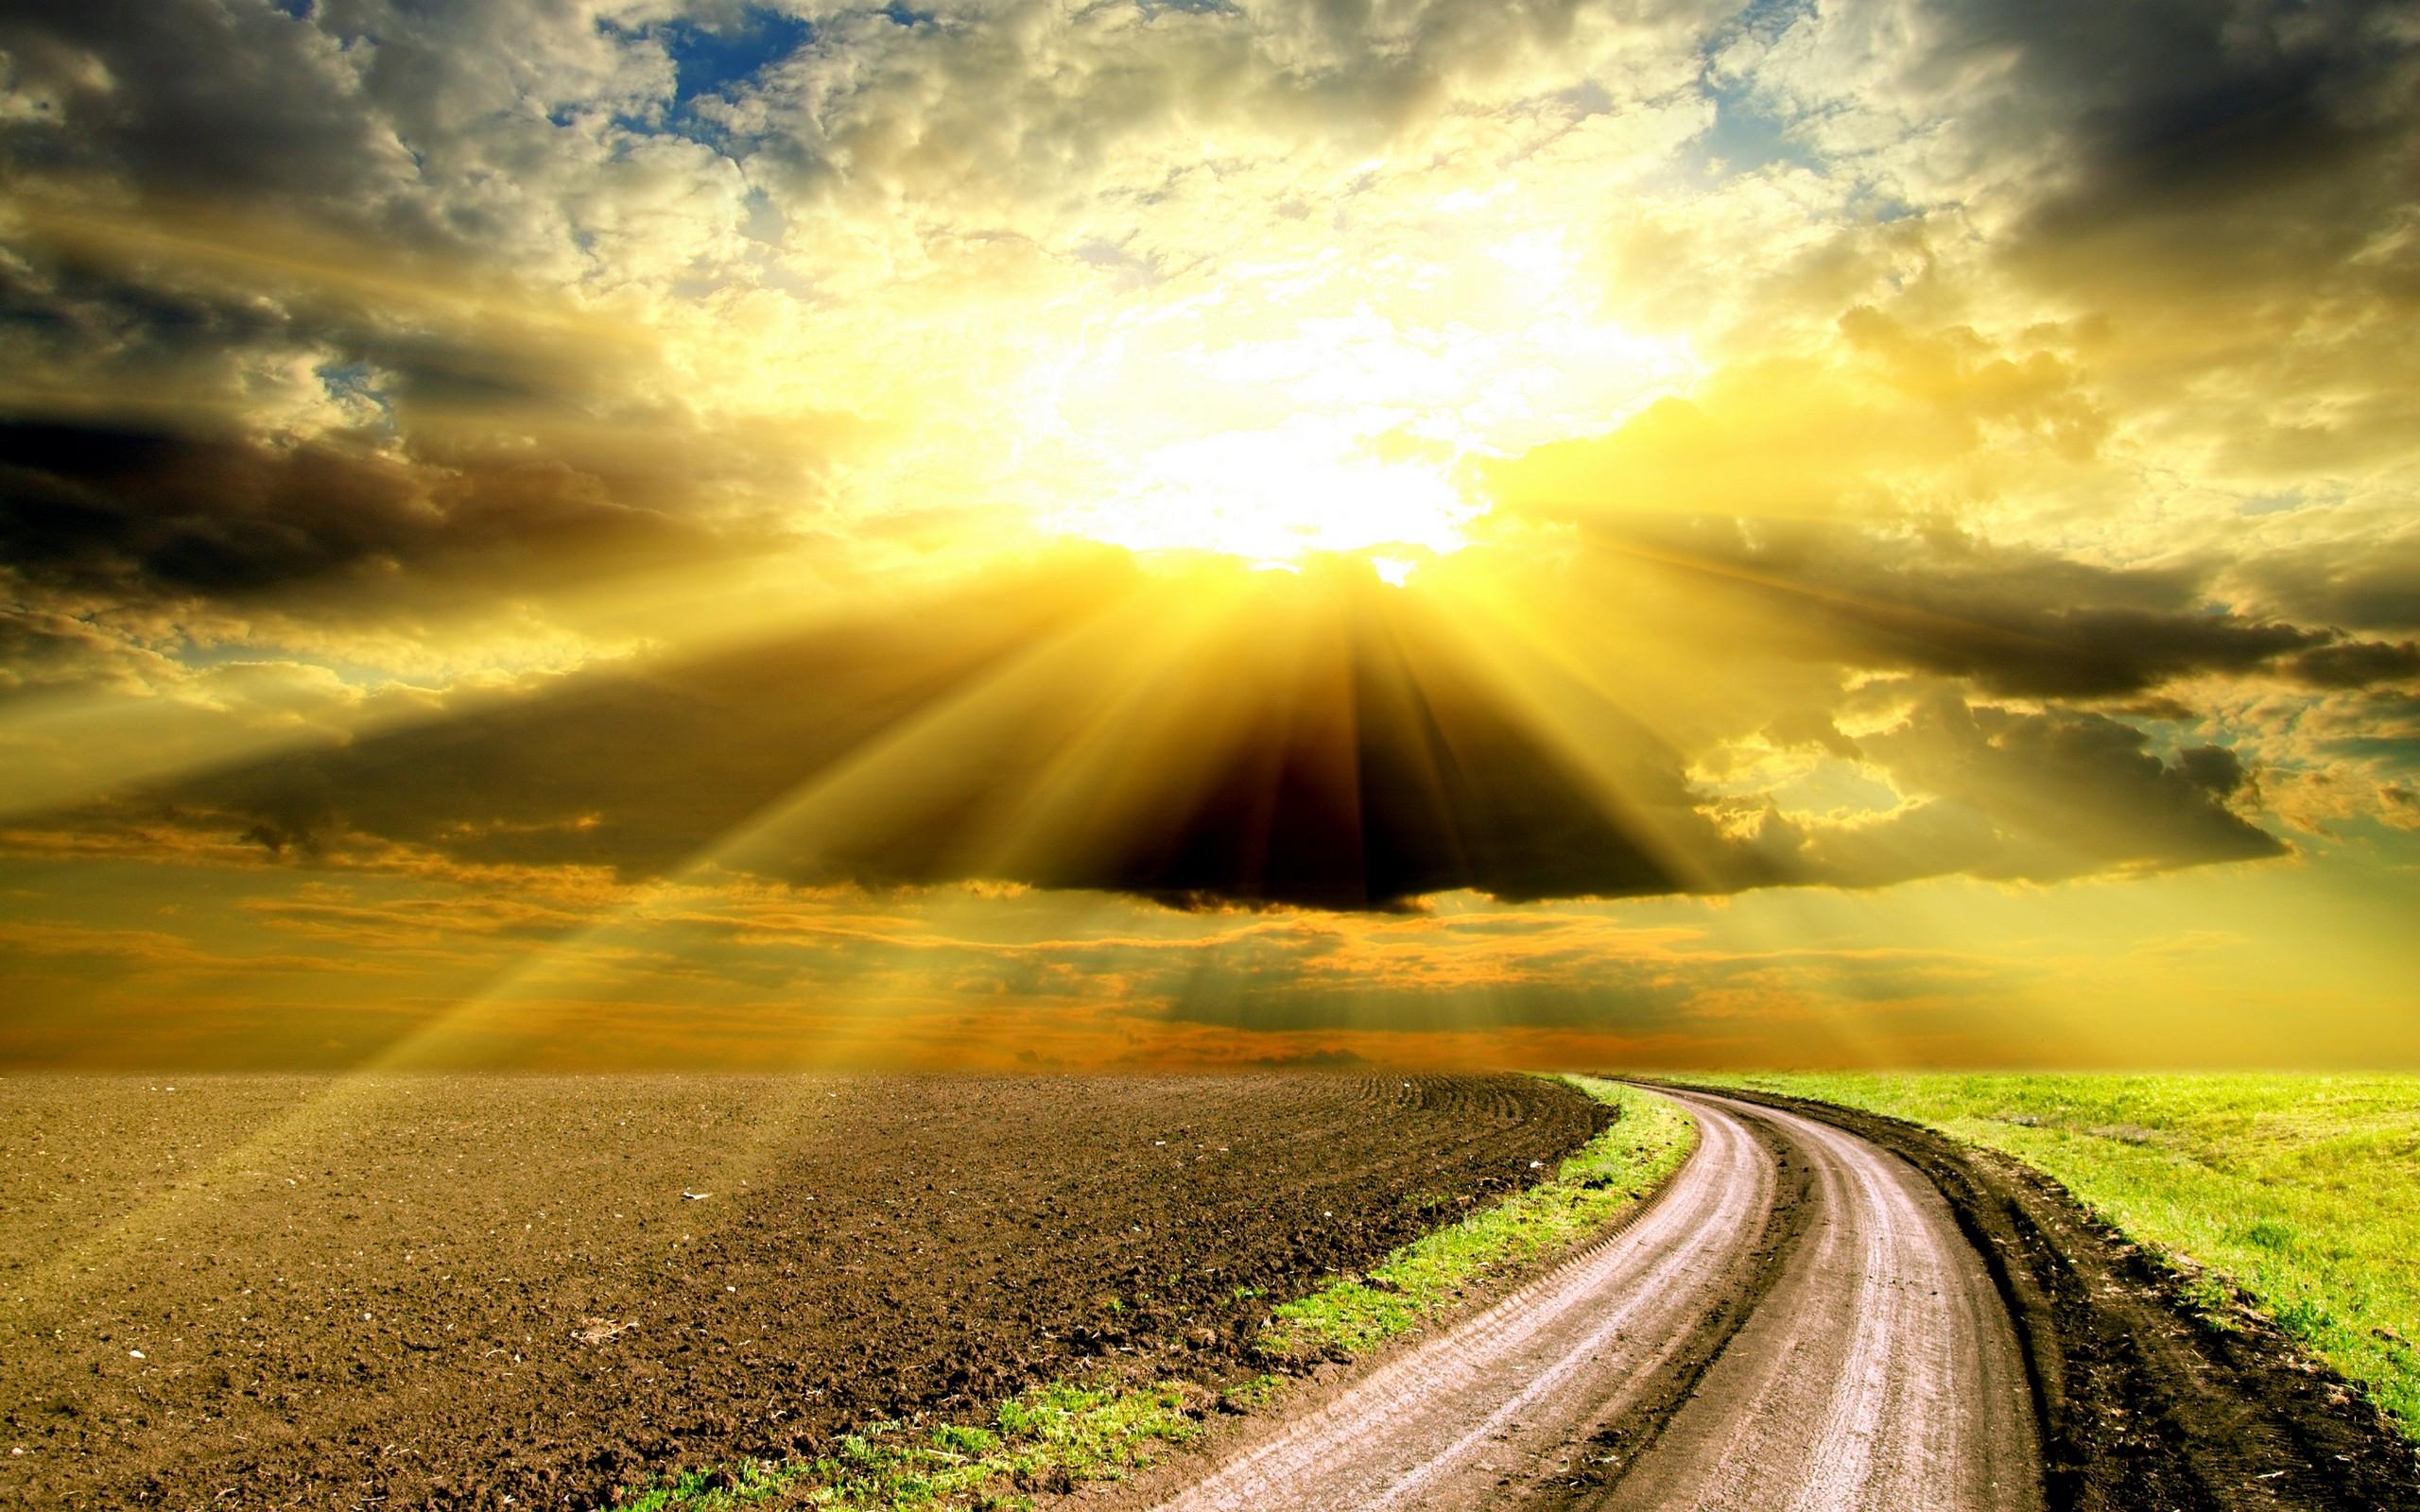 Sunlight Wallpaper Sunlight Wallpaper Sunlight Wallpaper ...